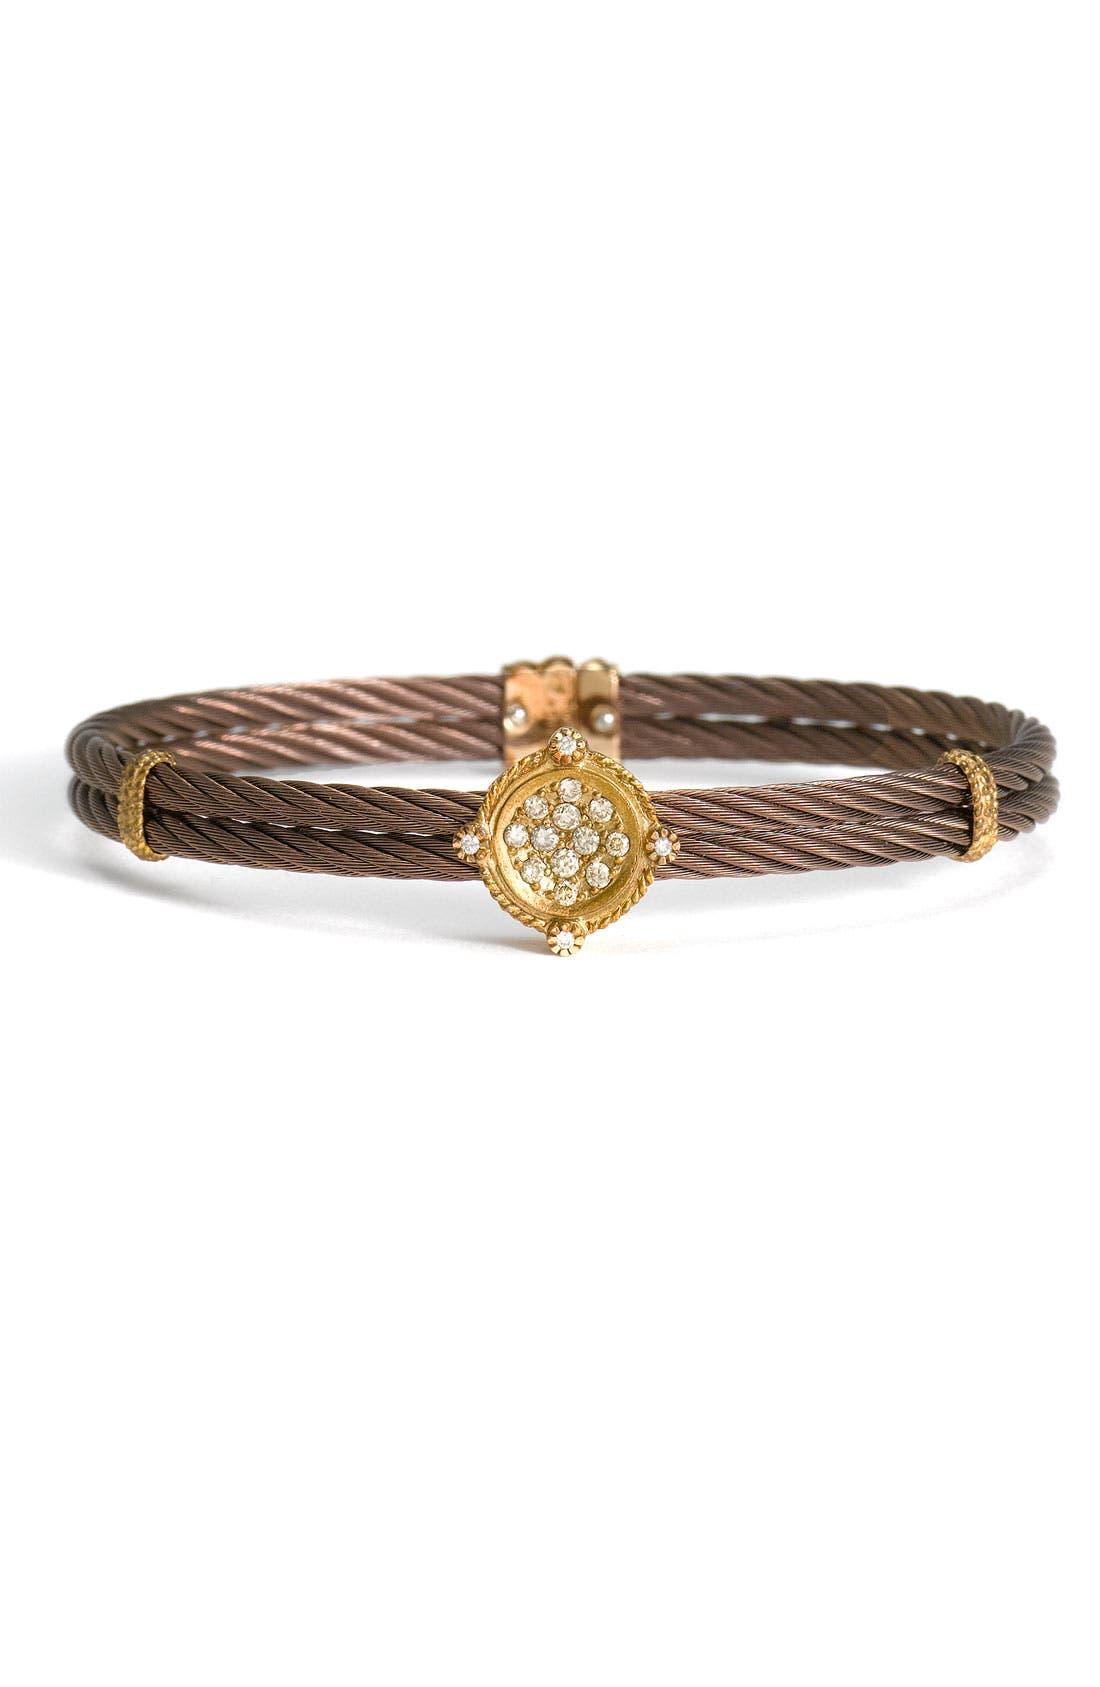 Alternate Image 1 Selected - ALOR® Champagne Diamond & Bronze Bracelet